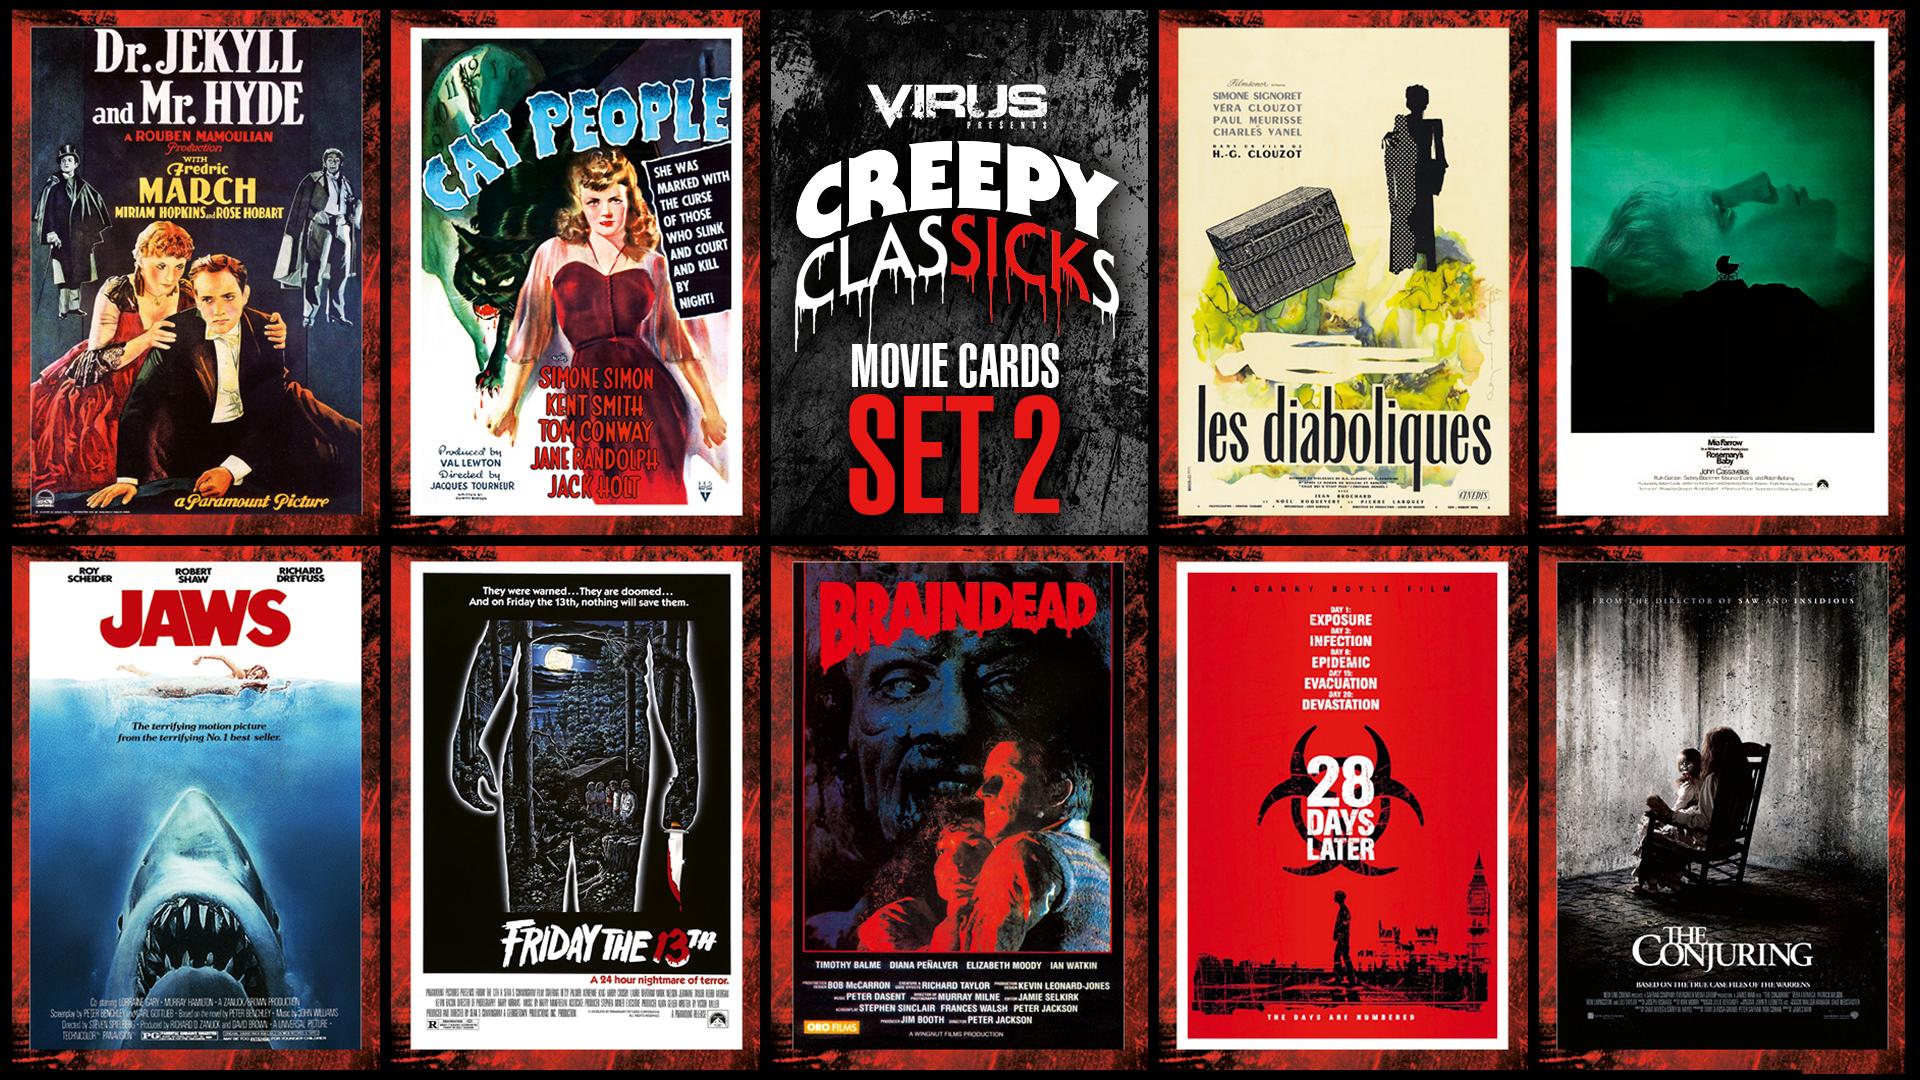 VIRUS Creepy ClasSICKs Movie Cards Set #02